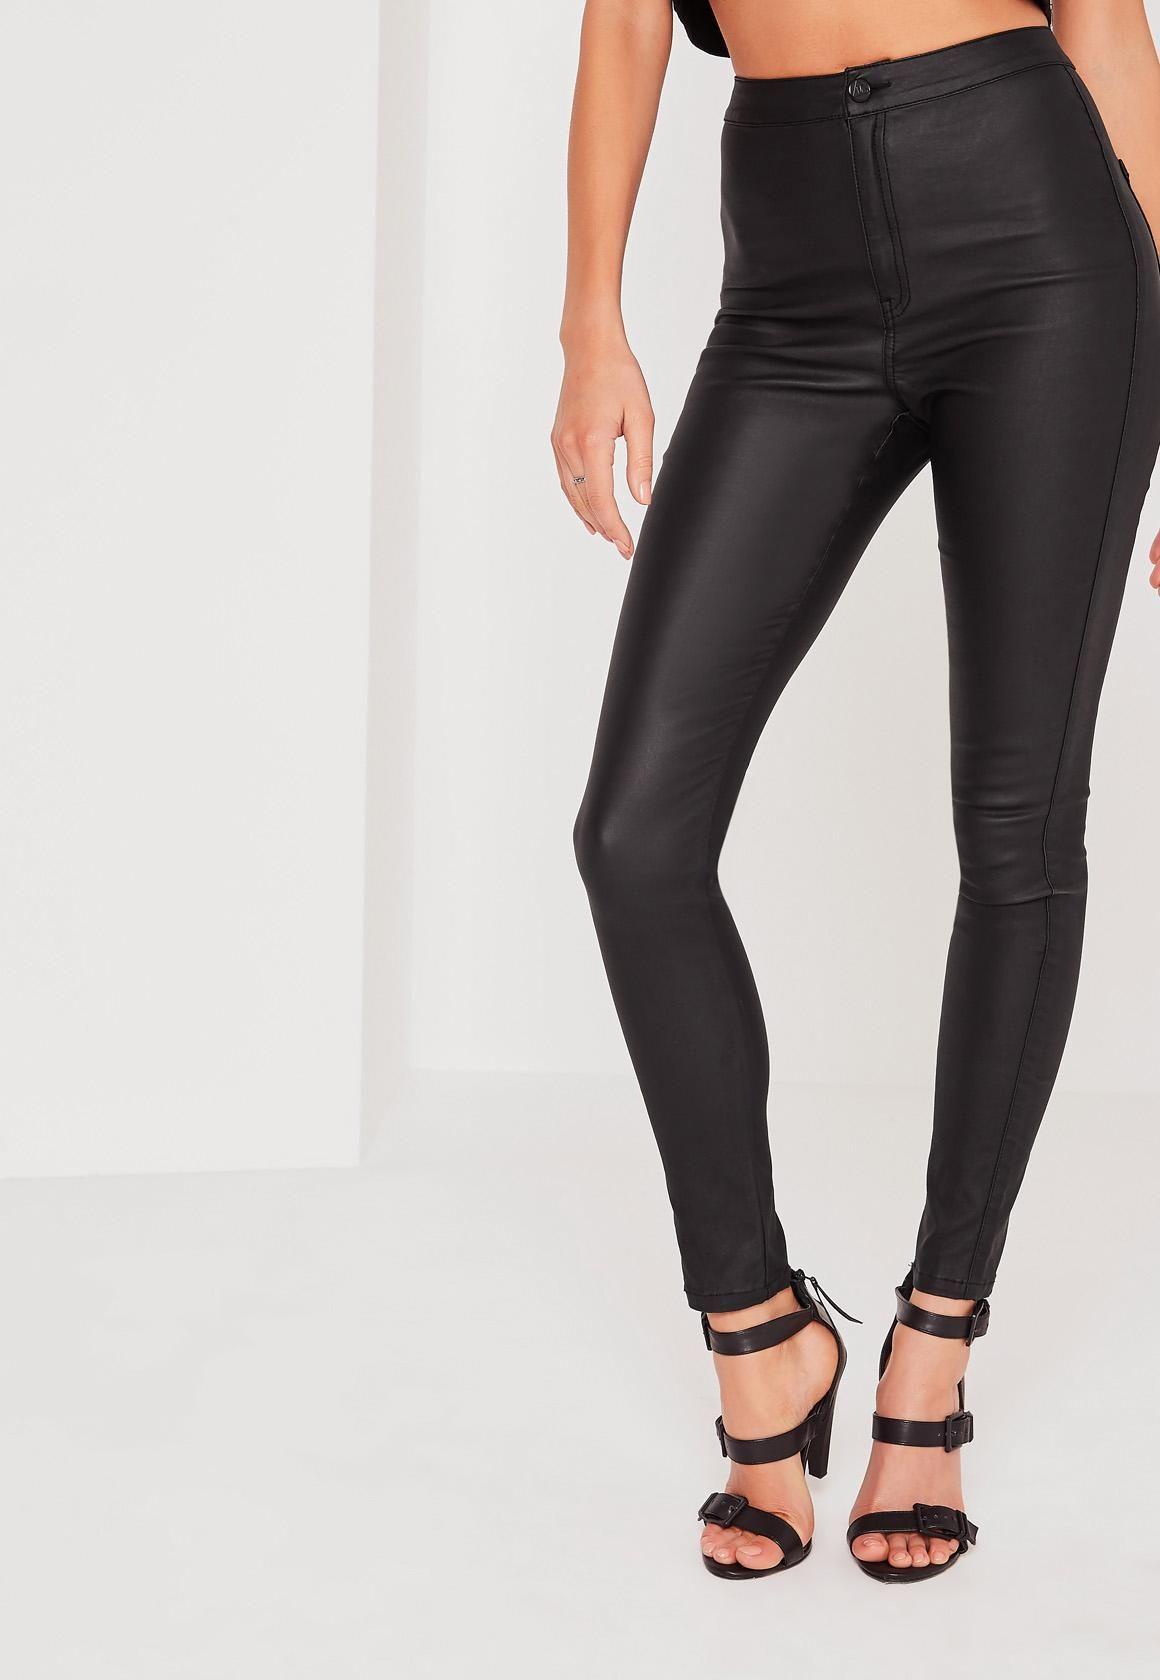 a0ccb96095a Black Vice High Waisted Coated Skinny Jeans